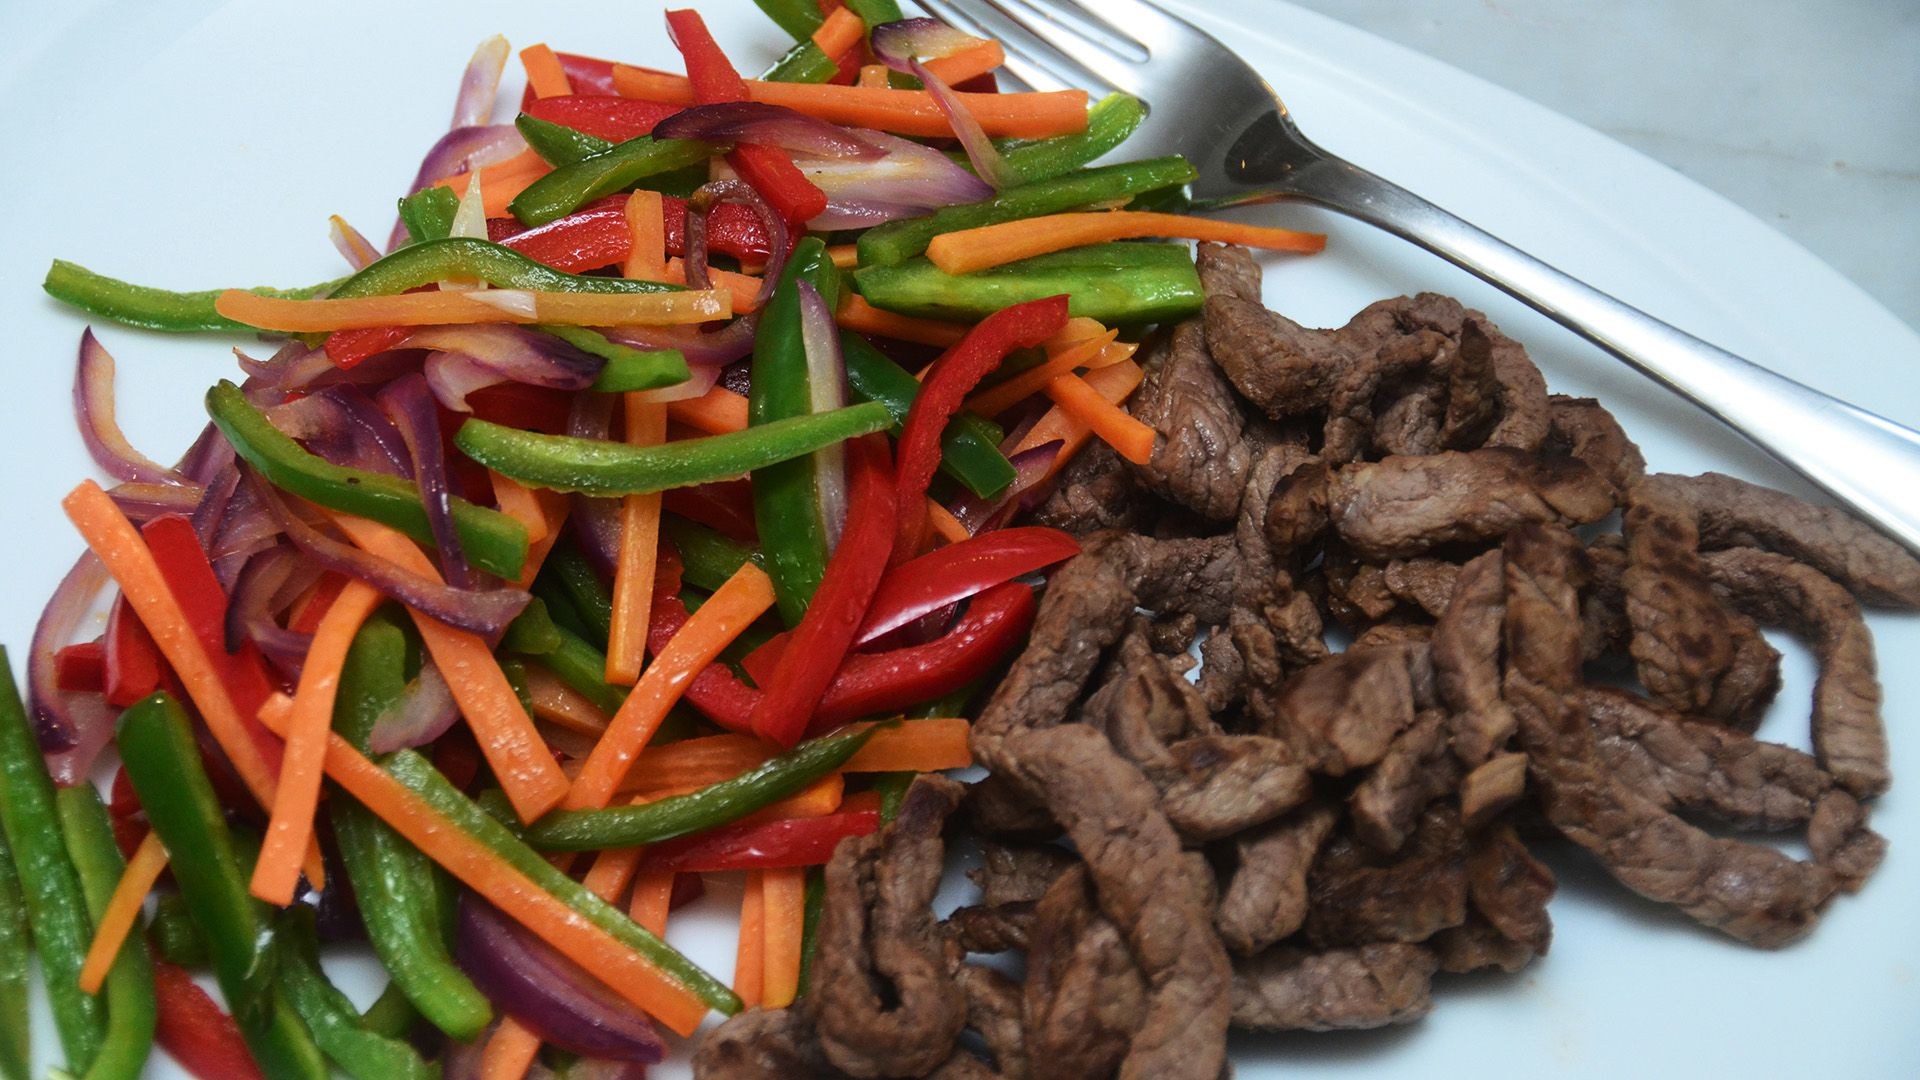 Vegetales con carne